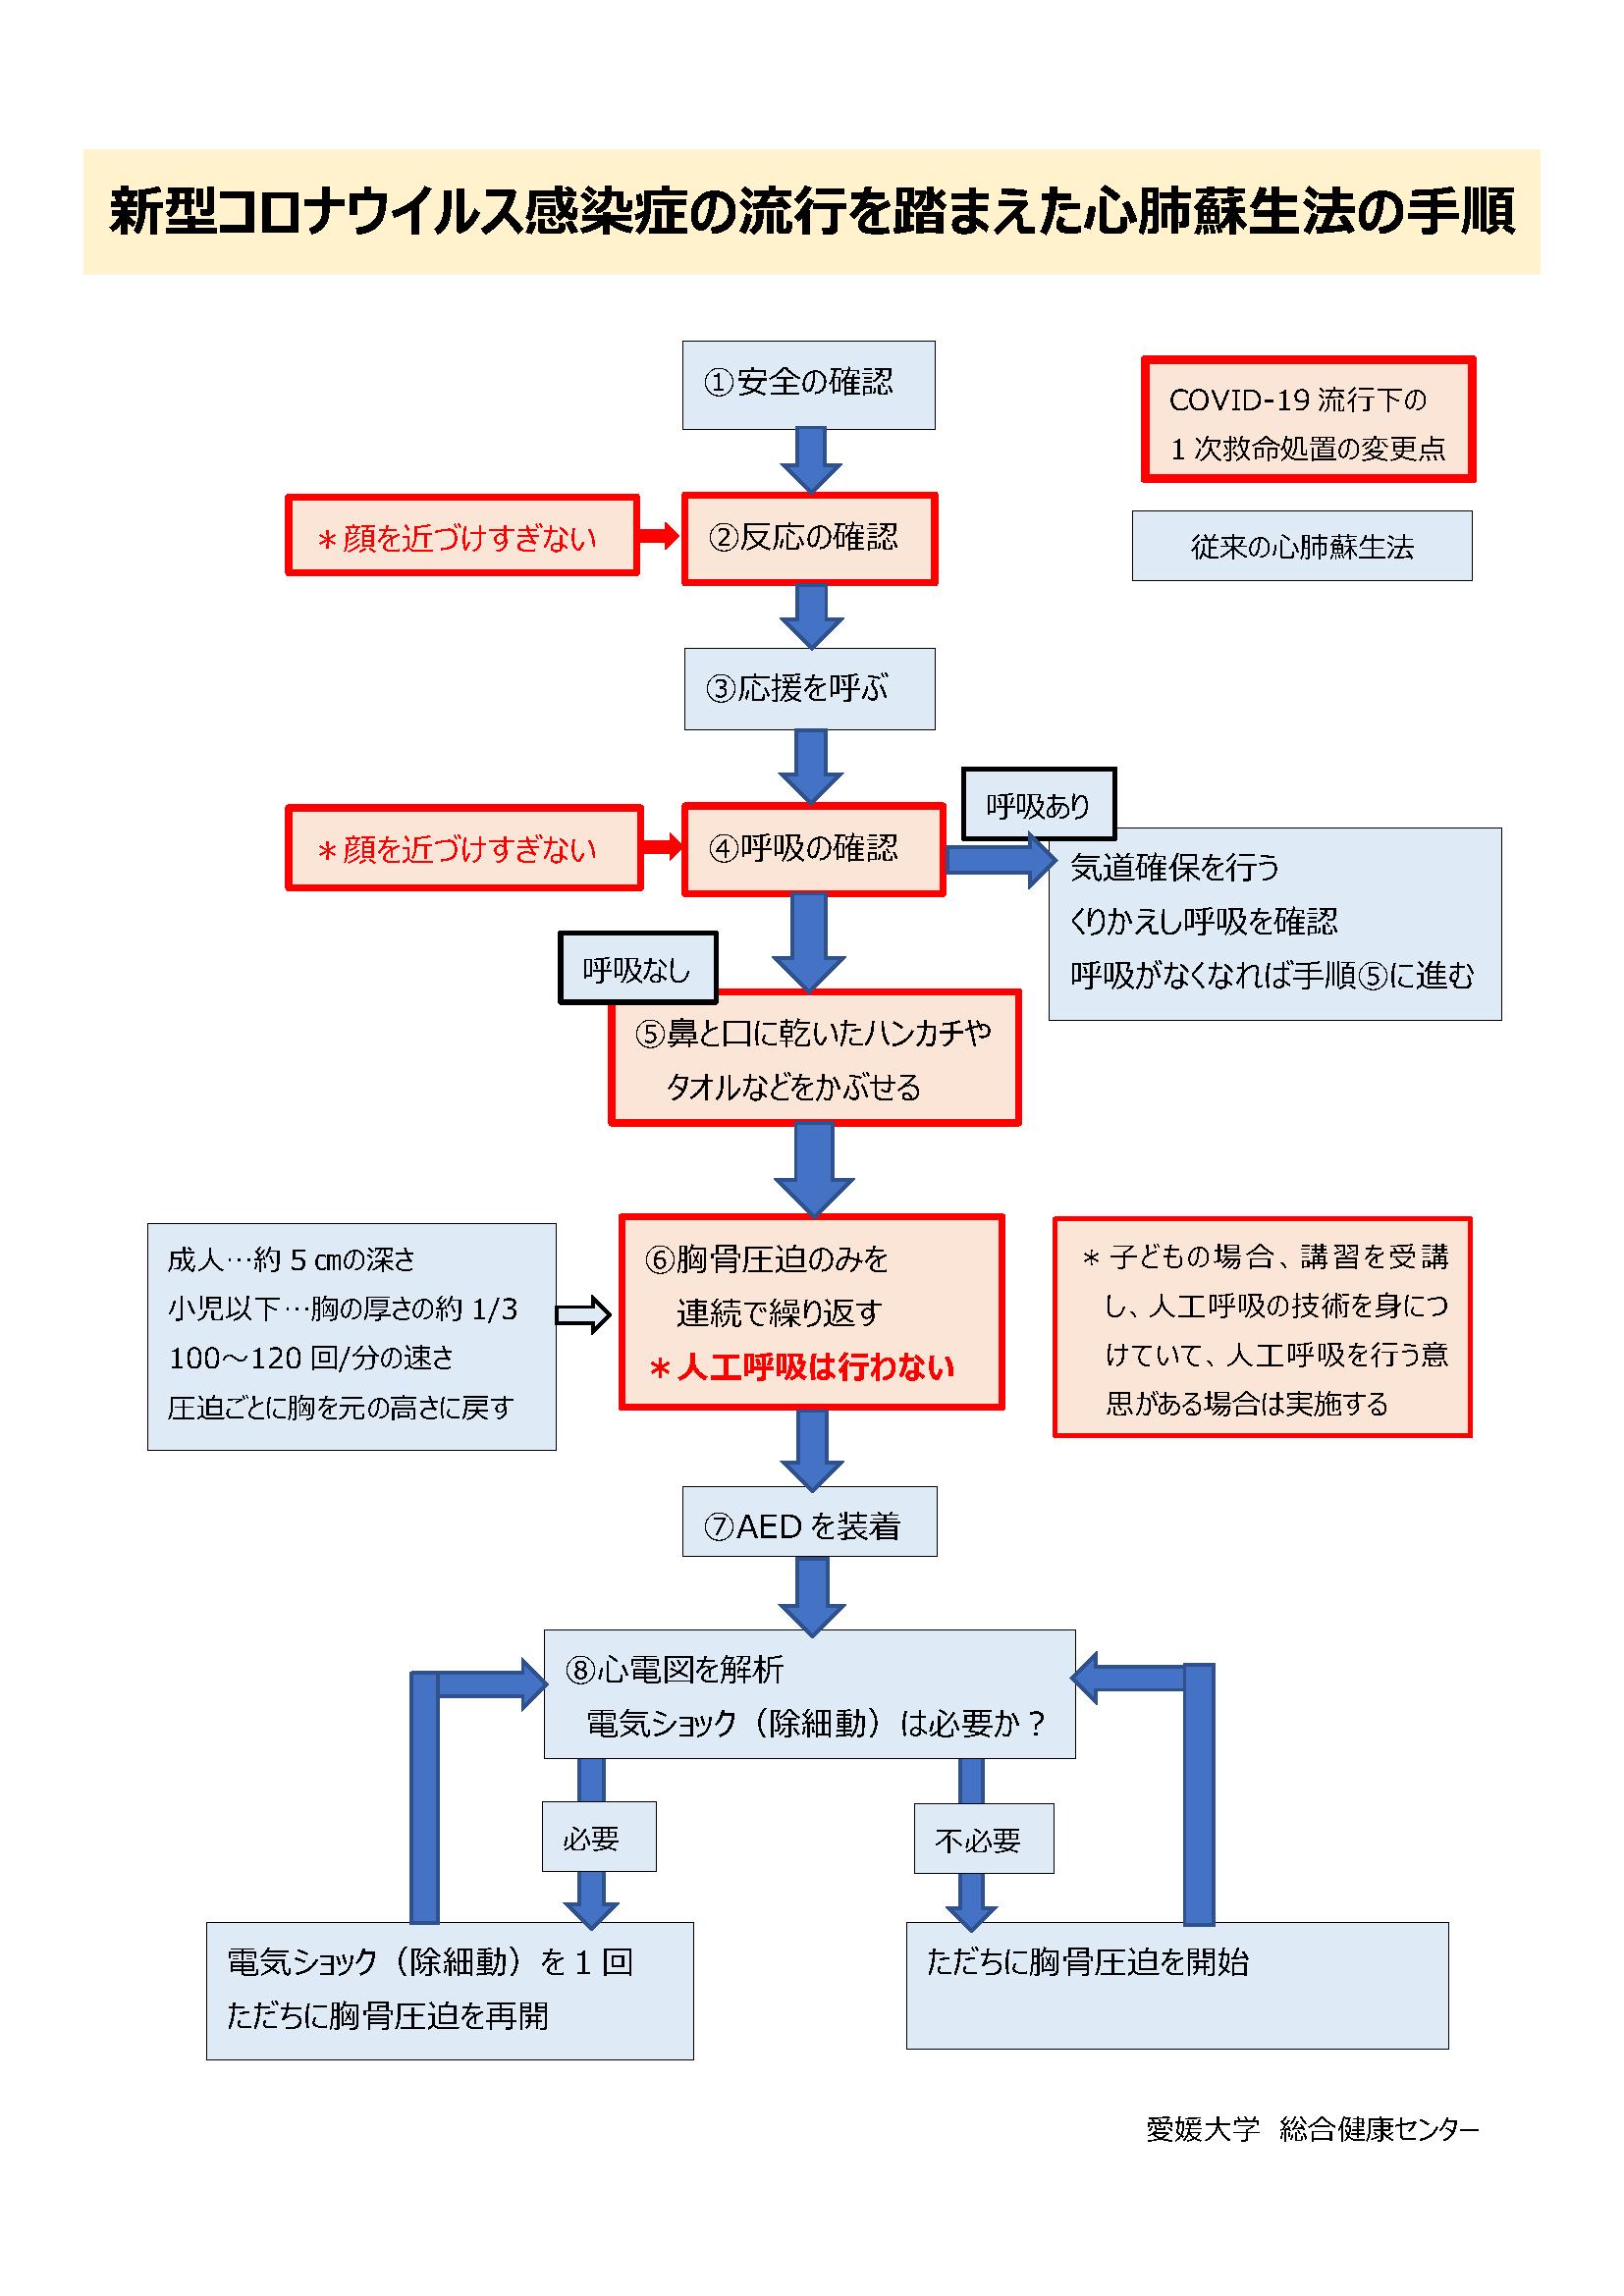 COVID-19流行を踏まえた心肺蘇生法手順.png